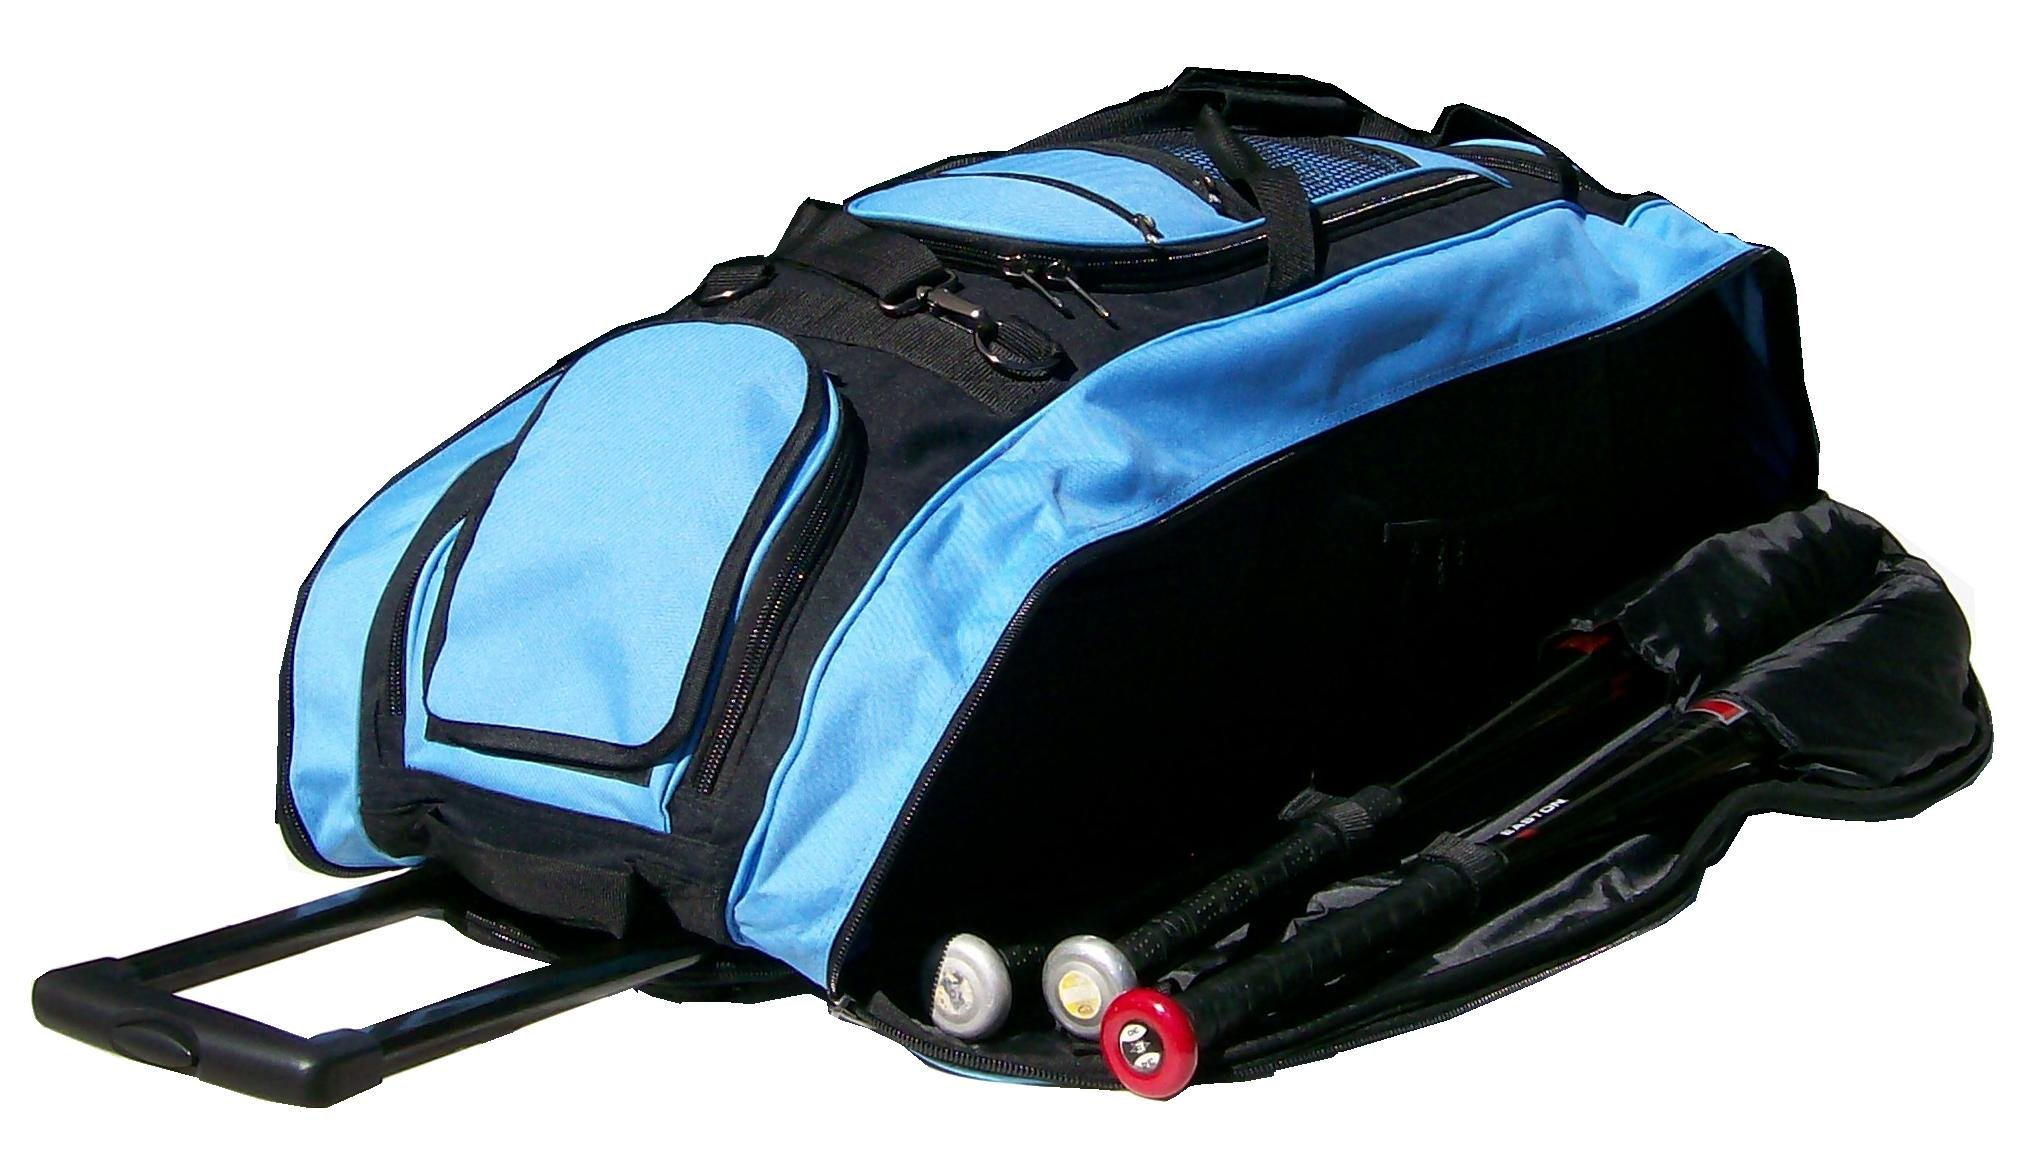 Black and Carolina Blue Cobra XL Softball Baseball Catchers Bat Equipment Roller Bag